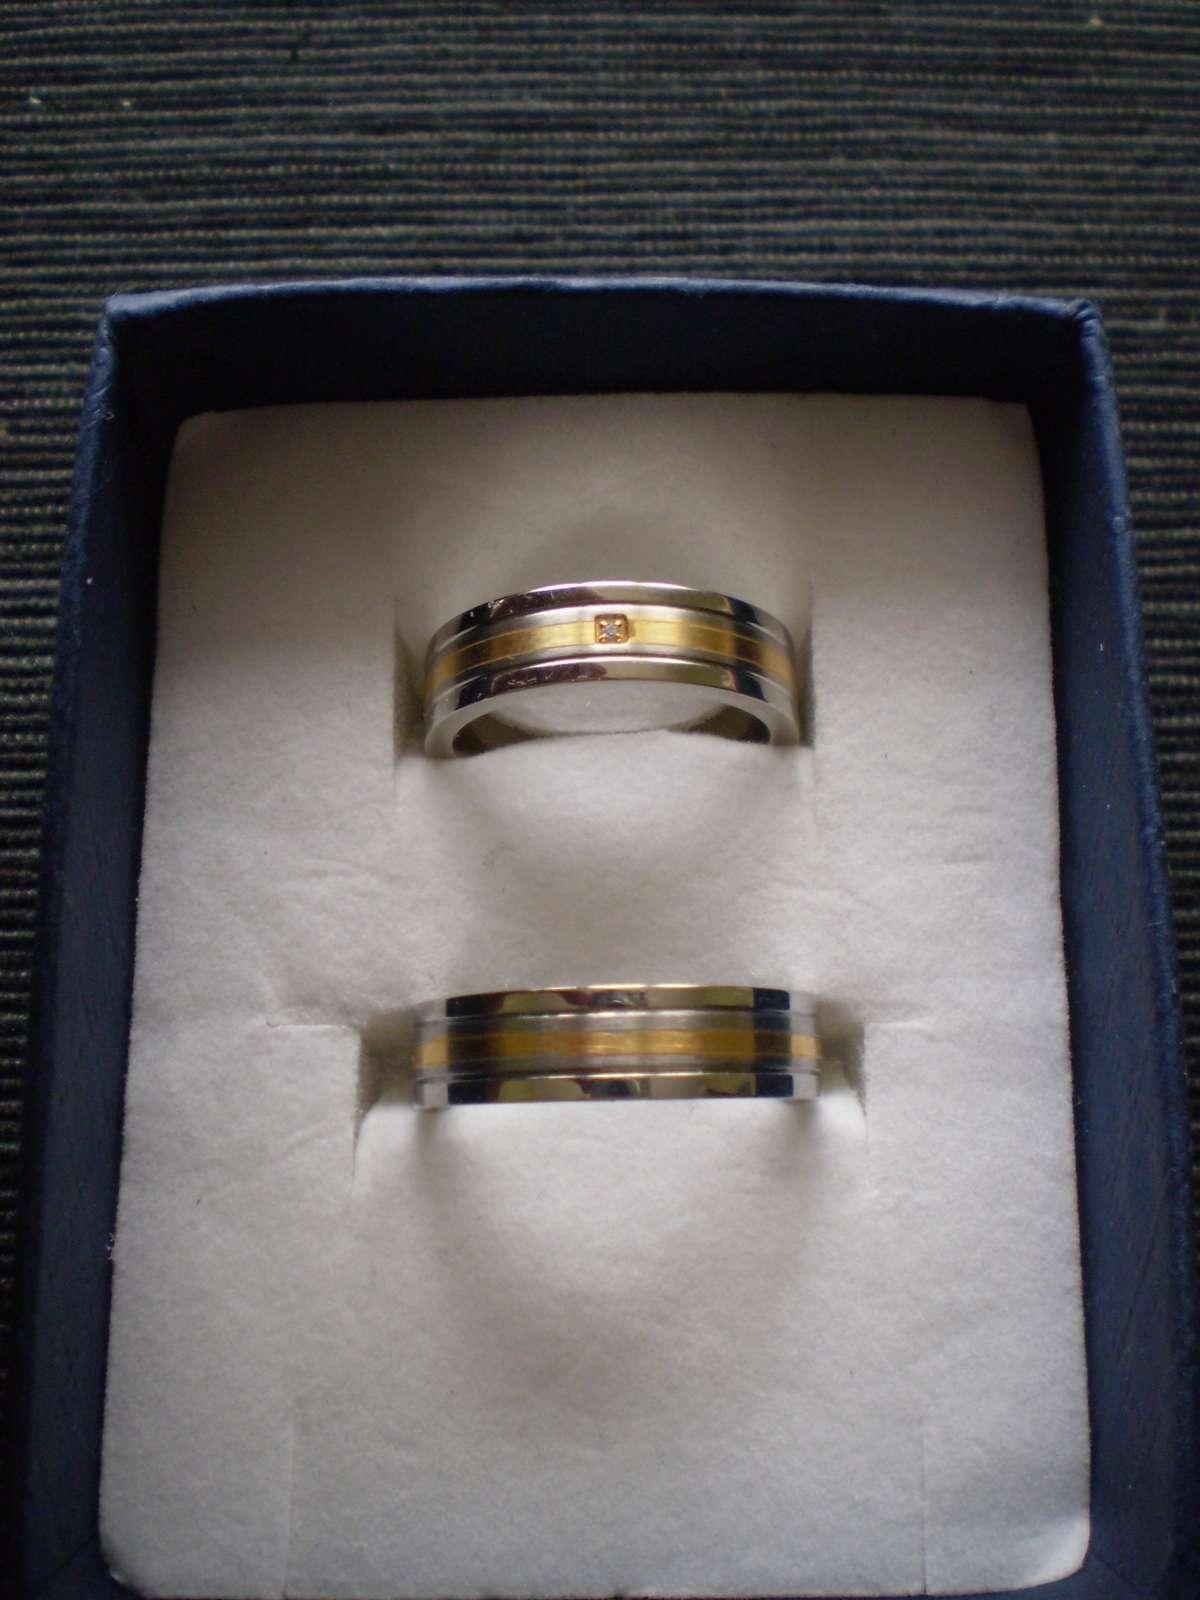 Snubni Prsteny Ocel 400 Kc Svatebni Bazar Beremese Cz